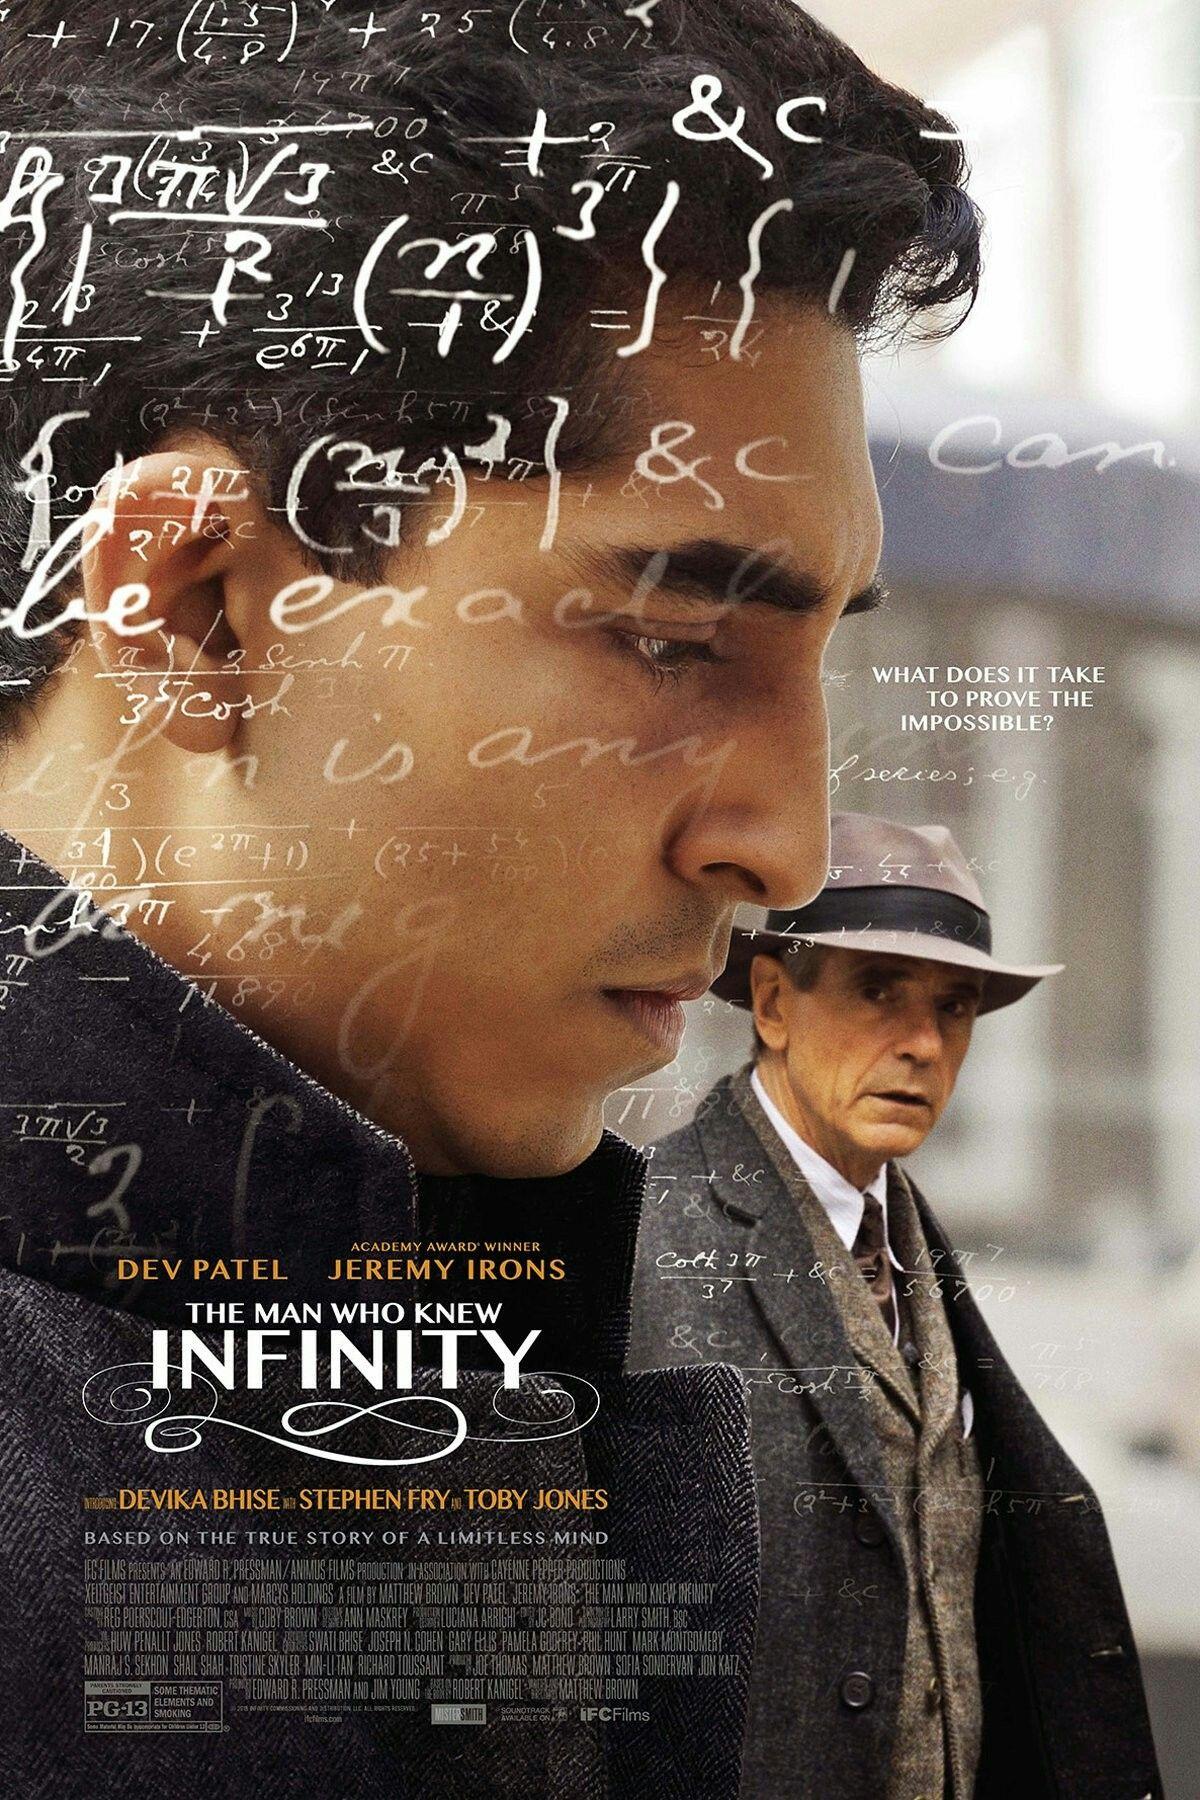 Movie - The Man Who Knew Infinity